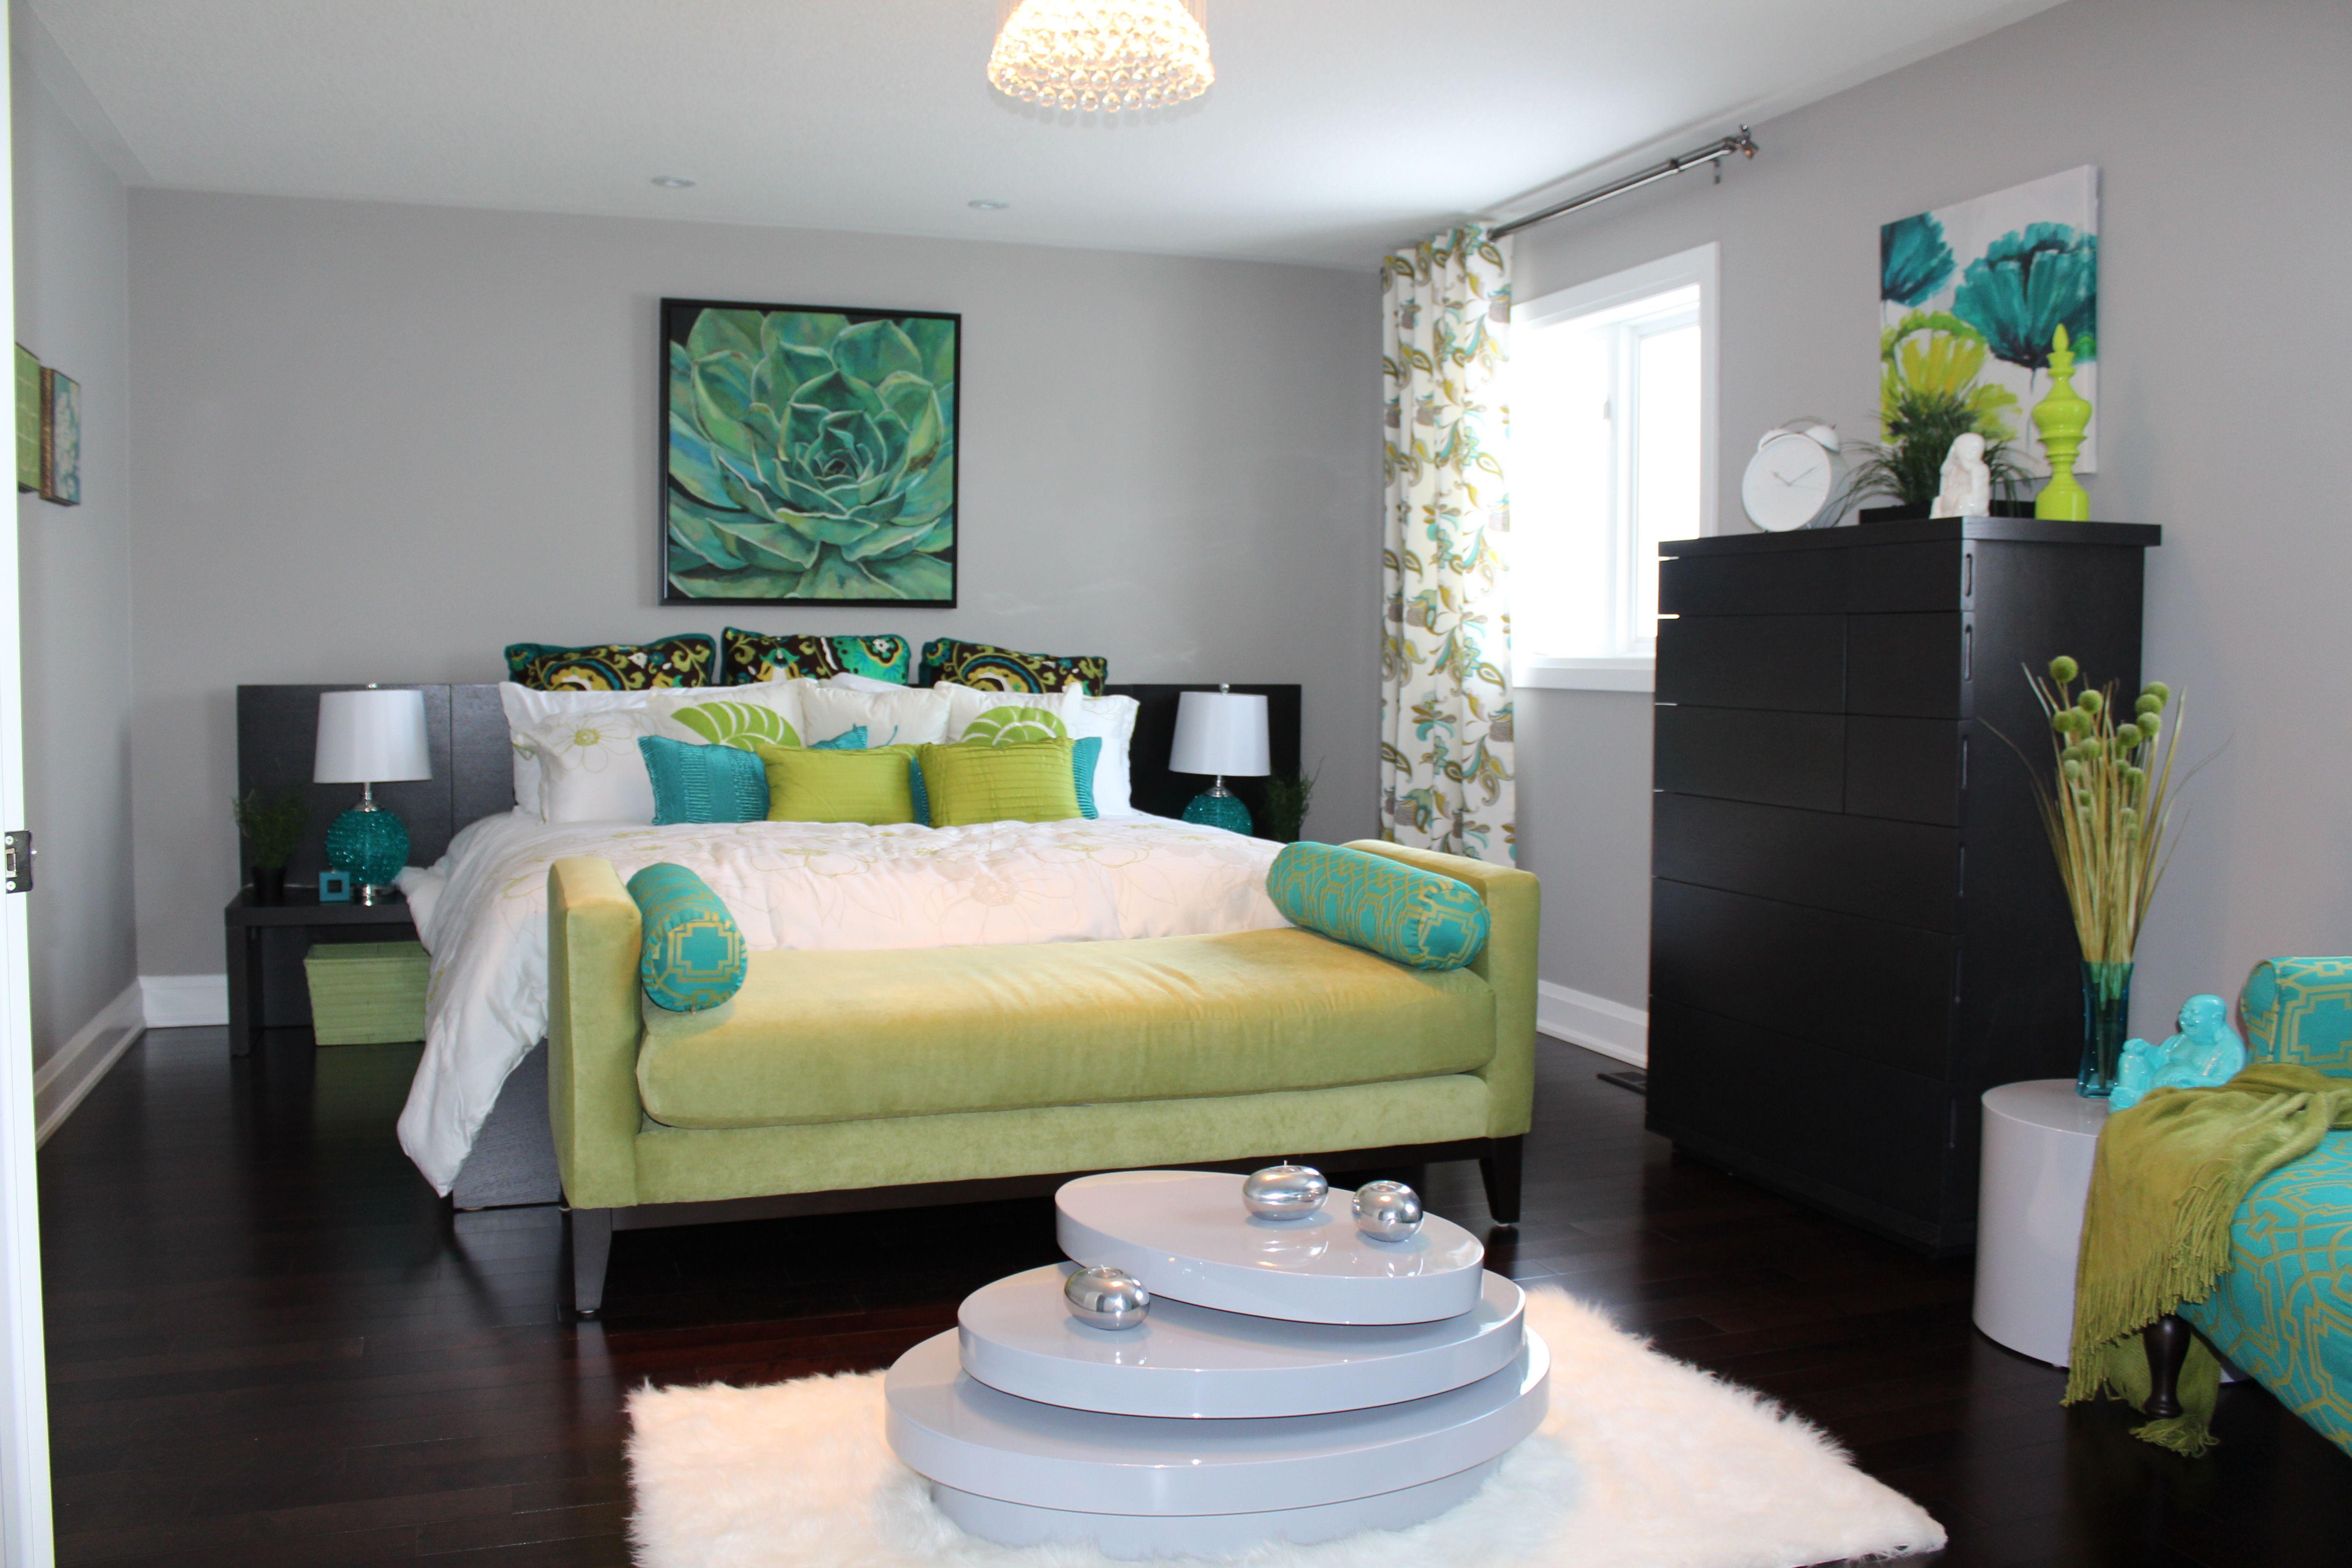 Master bedroom decor  Ridgemont  master bedroom Bedroom decor Home Decor Home Design